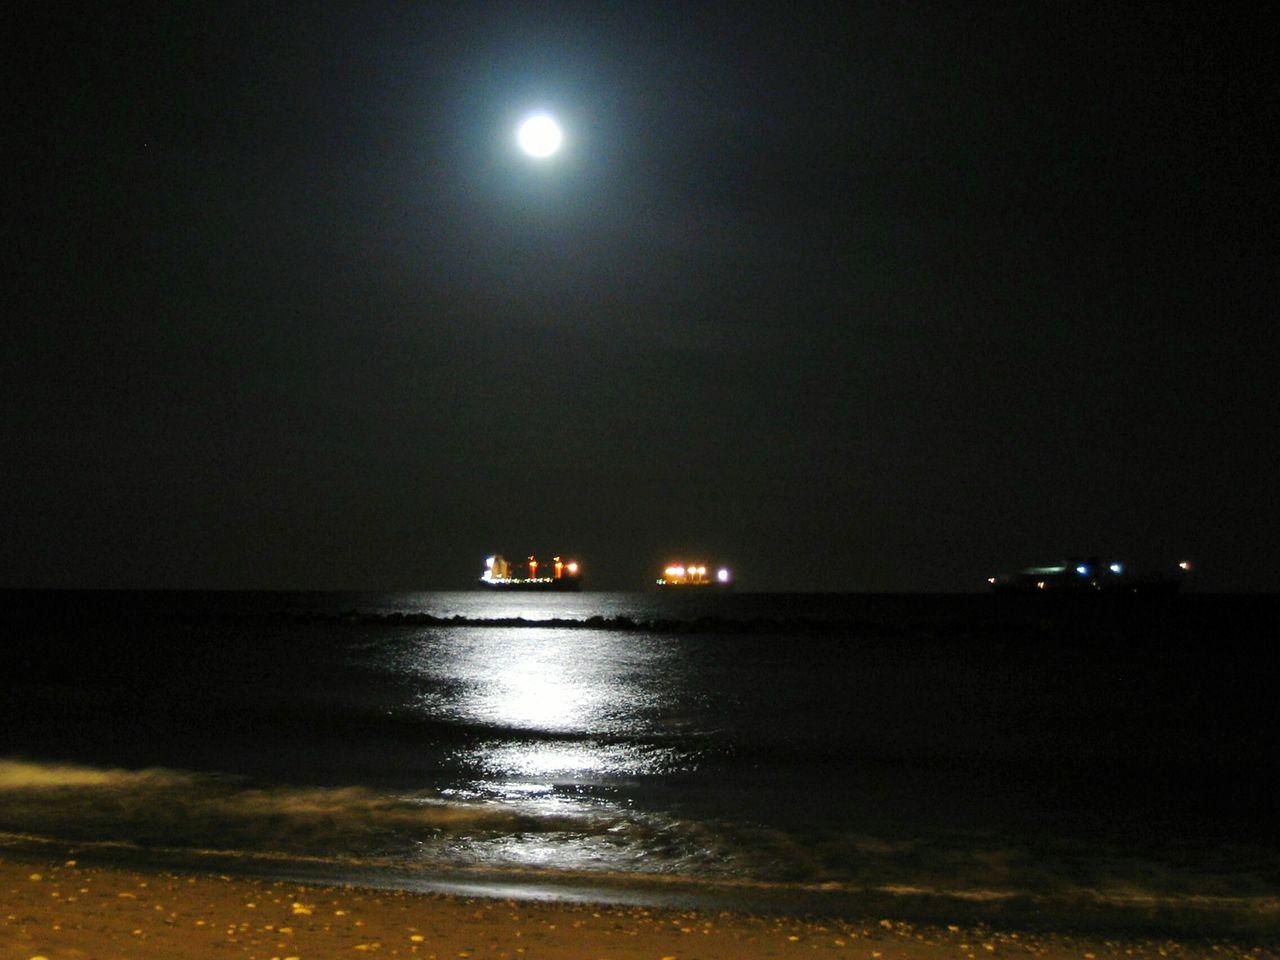 night, illuminated, moon, no people, sea, nature, sky, outdoors, beauty in nature, water, scenics, nautical vessel